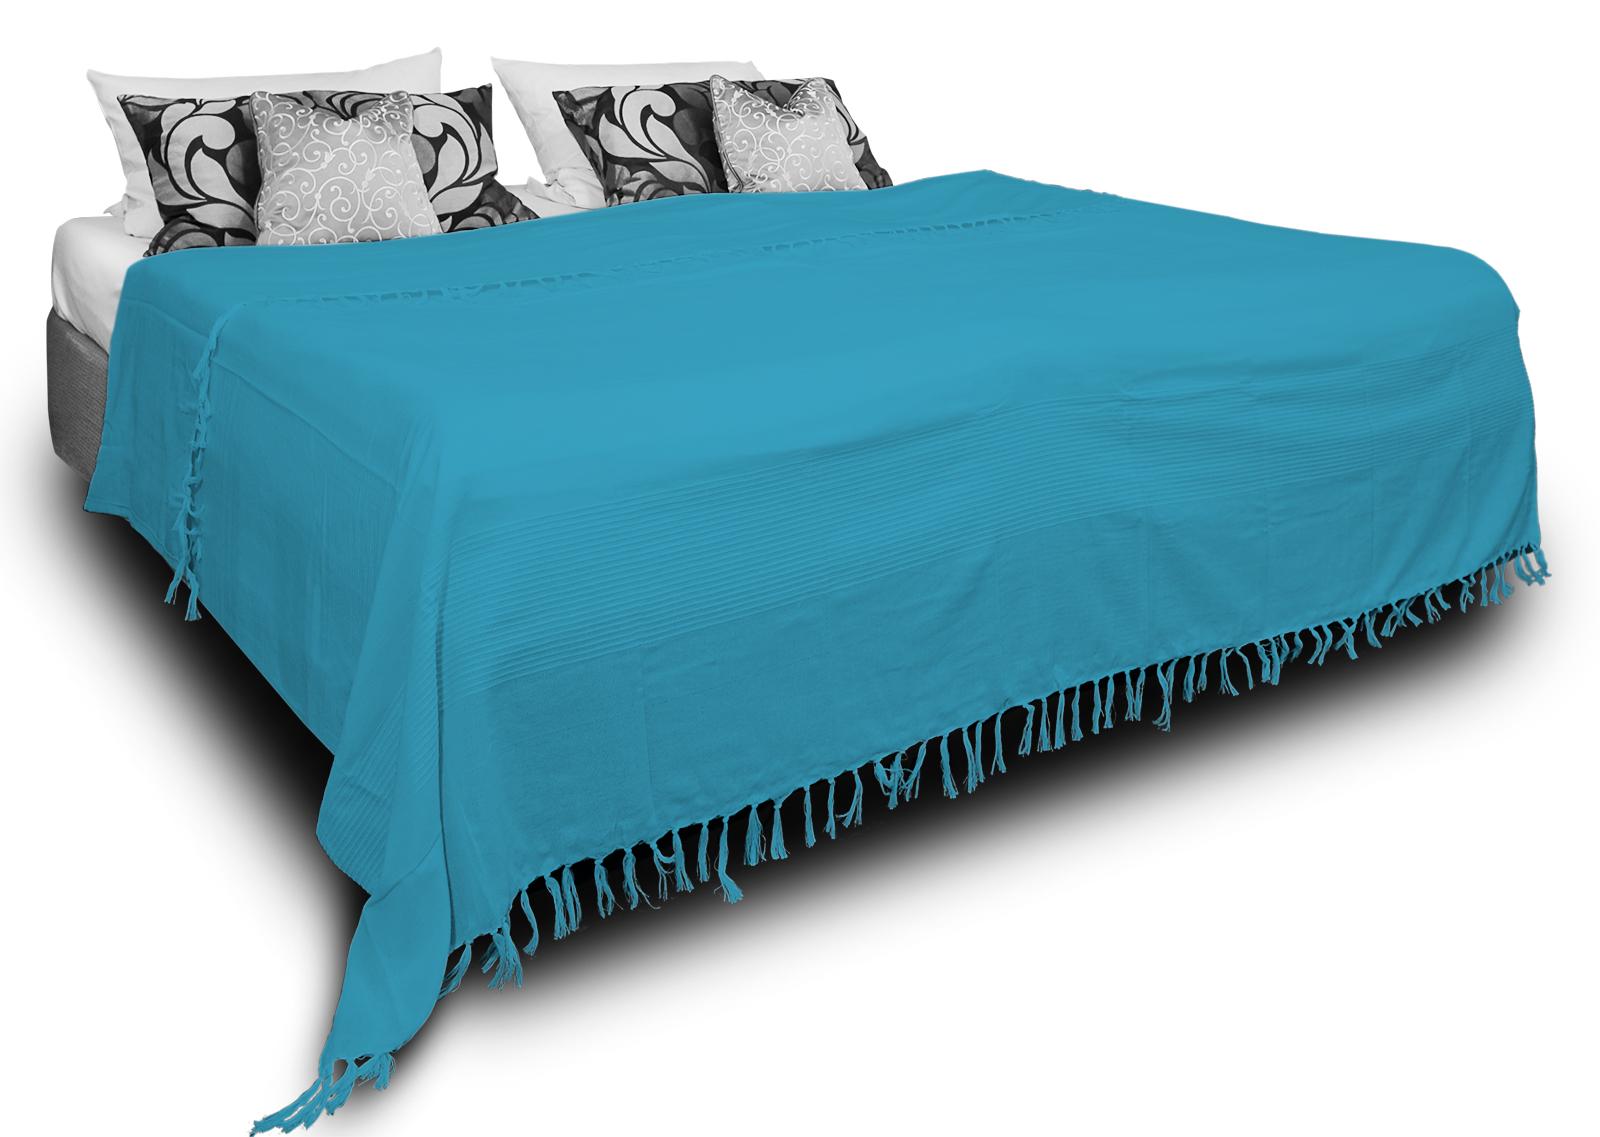 Tagesdecke Bettüberwurf 220x240 cm türkis Bettdecke Doppelbett Sofa Baumwolle